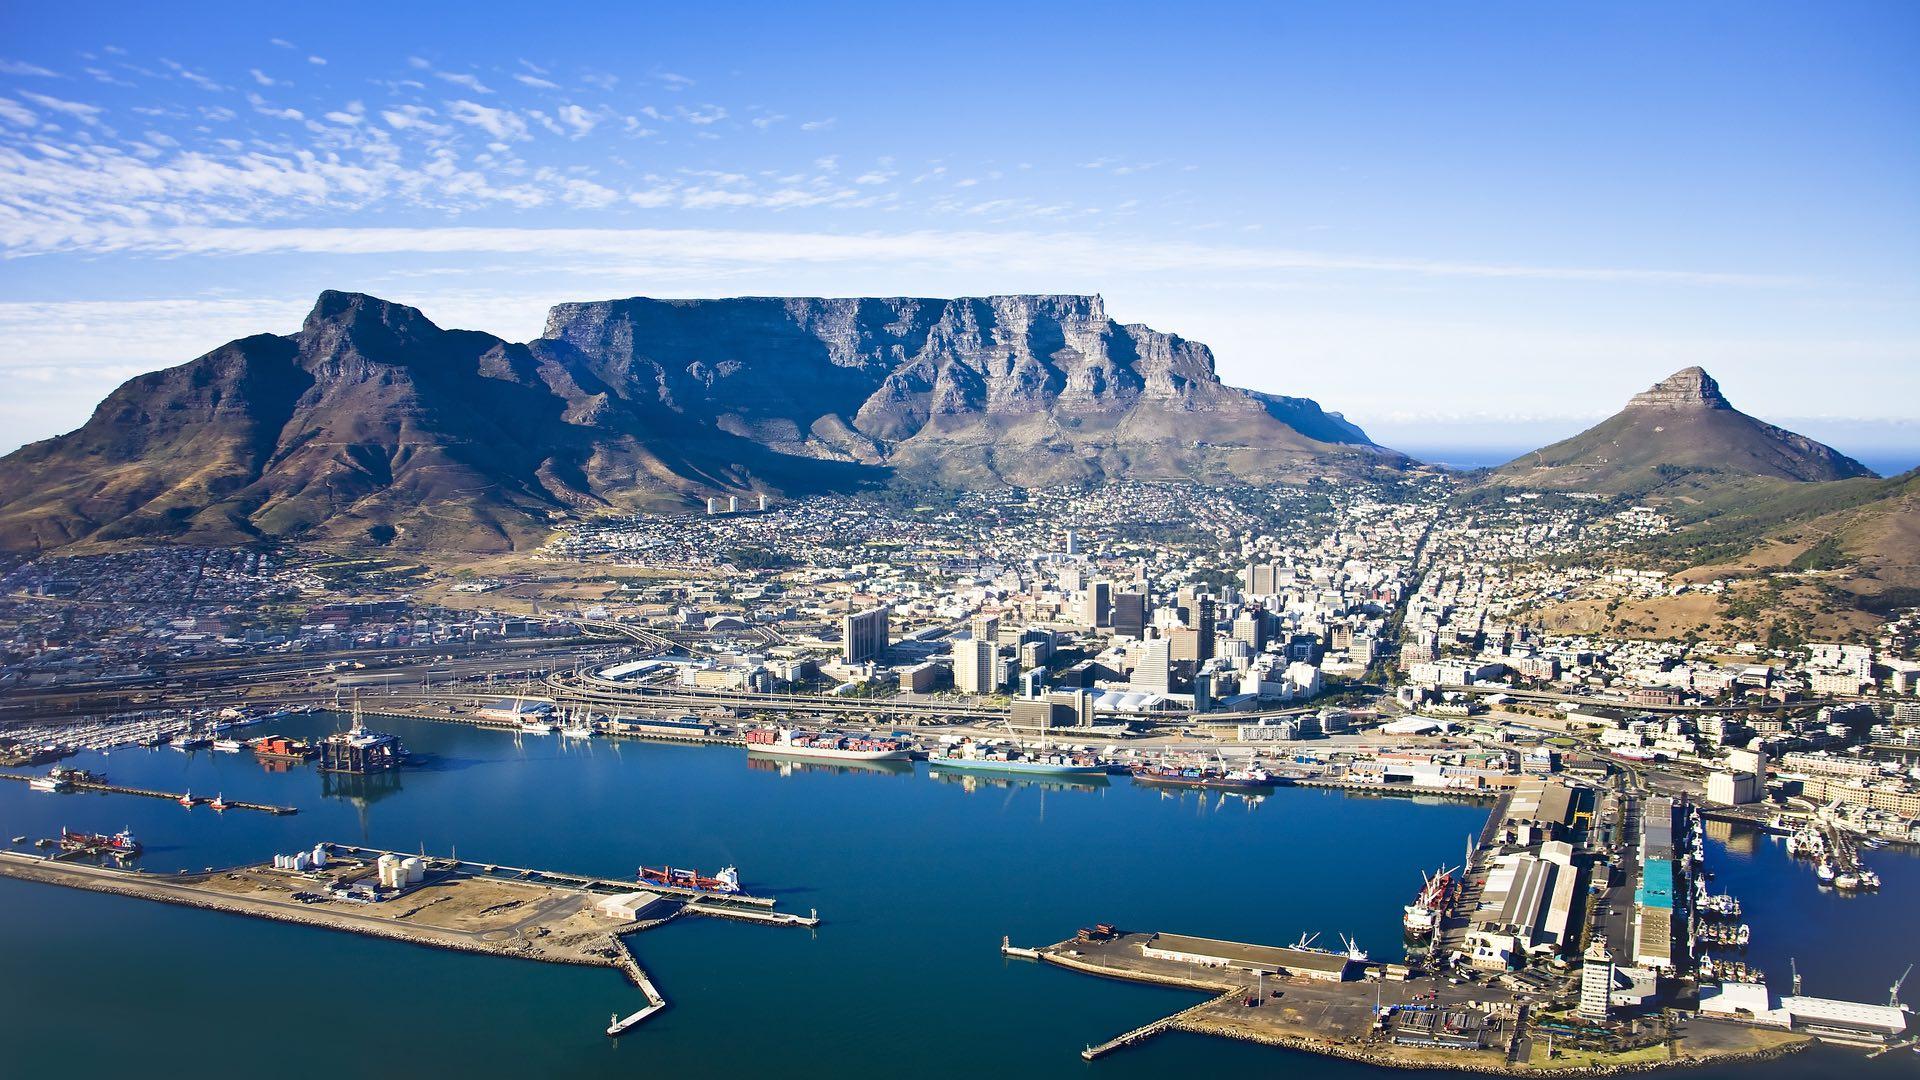 Südafrika | Kapstadt | ©Andrea Willmore/Shutterstock.com